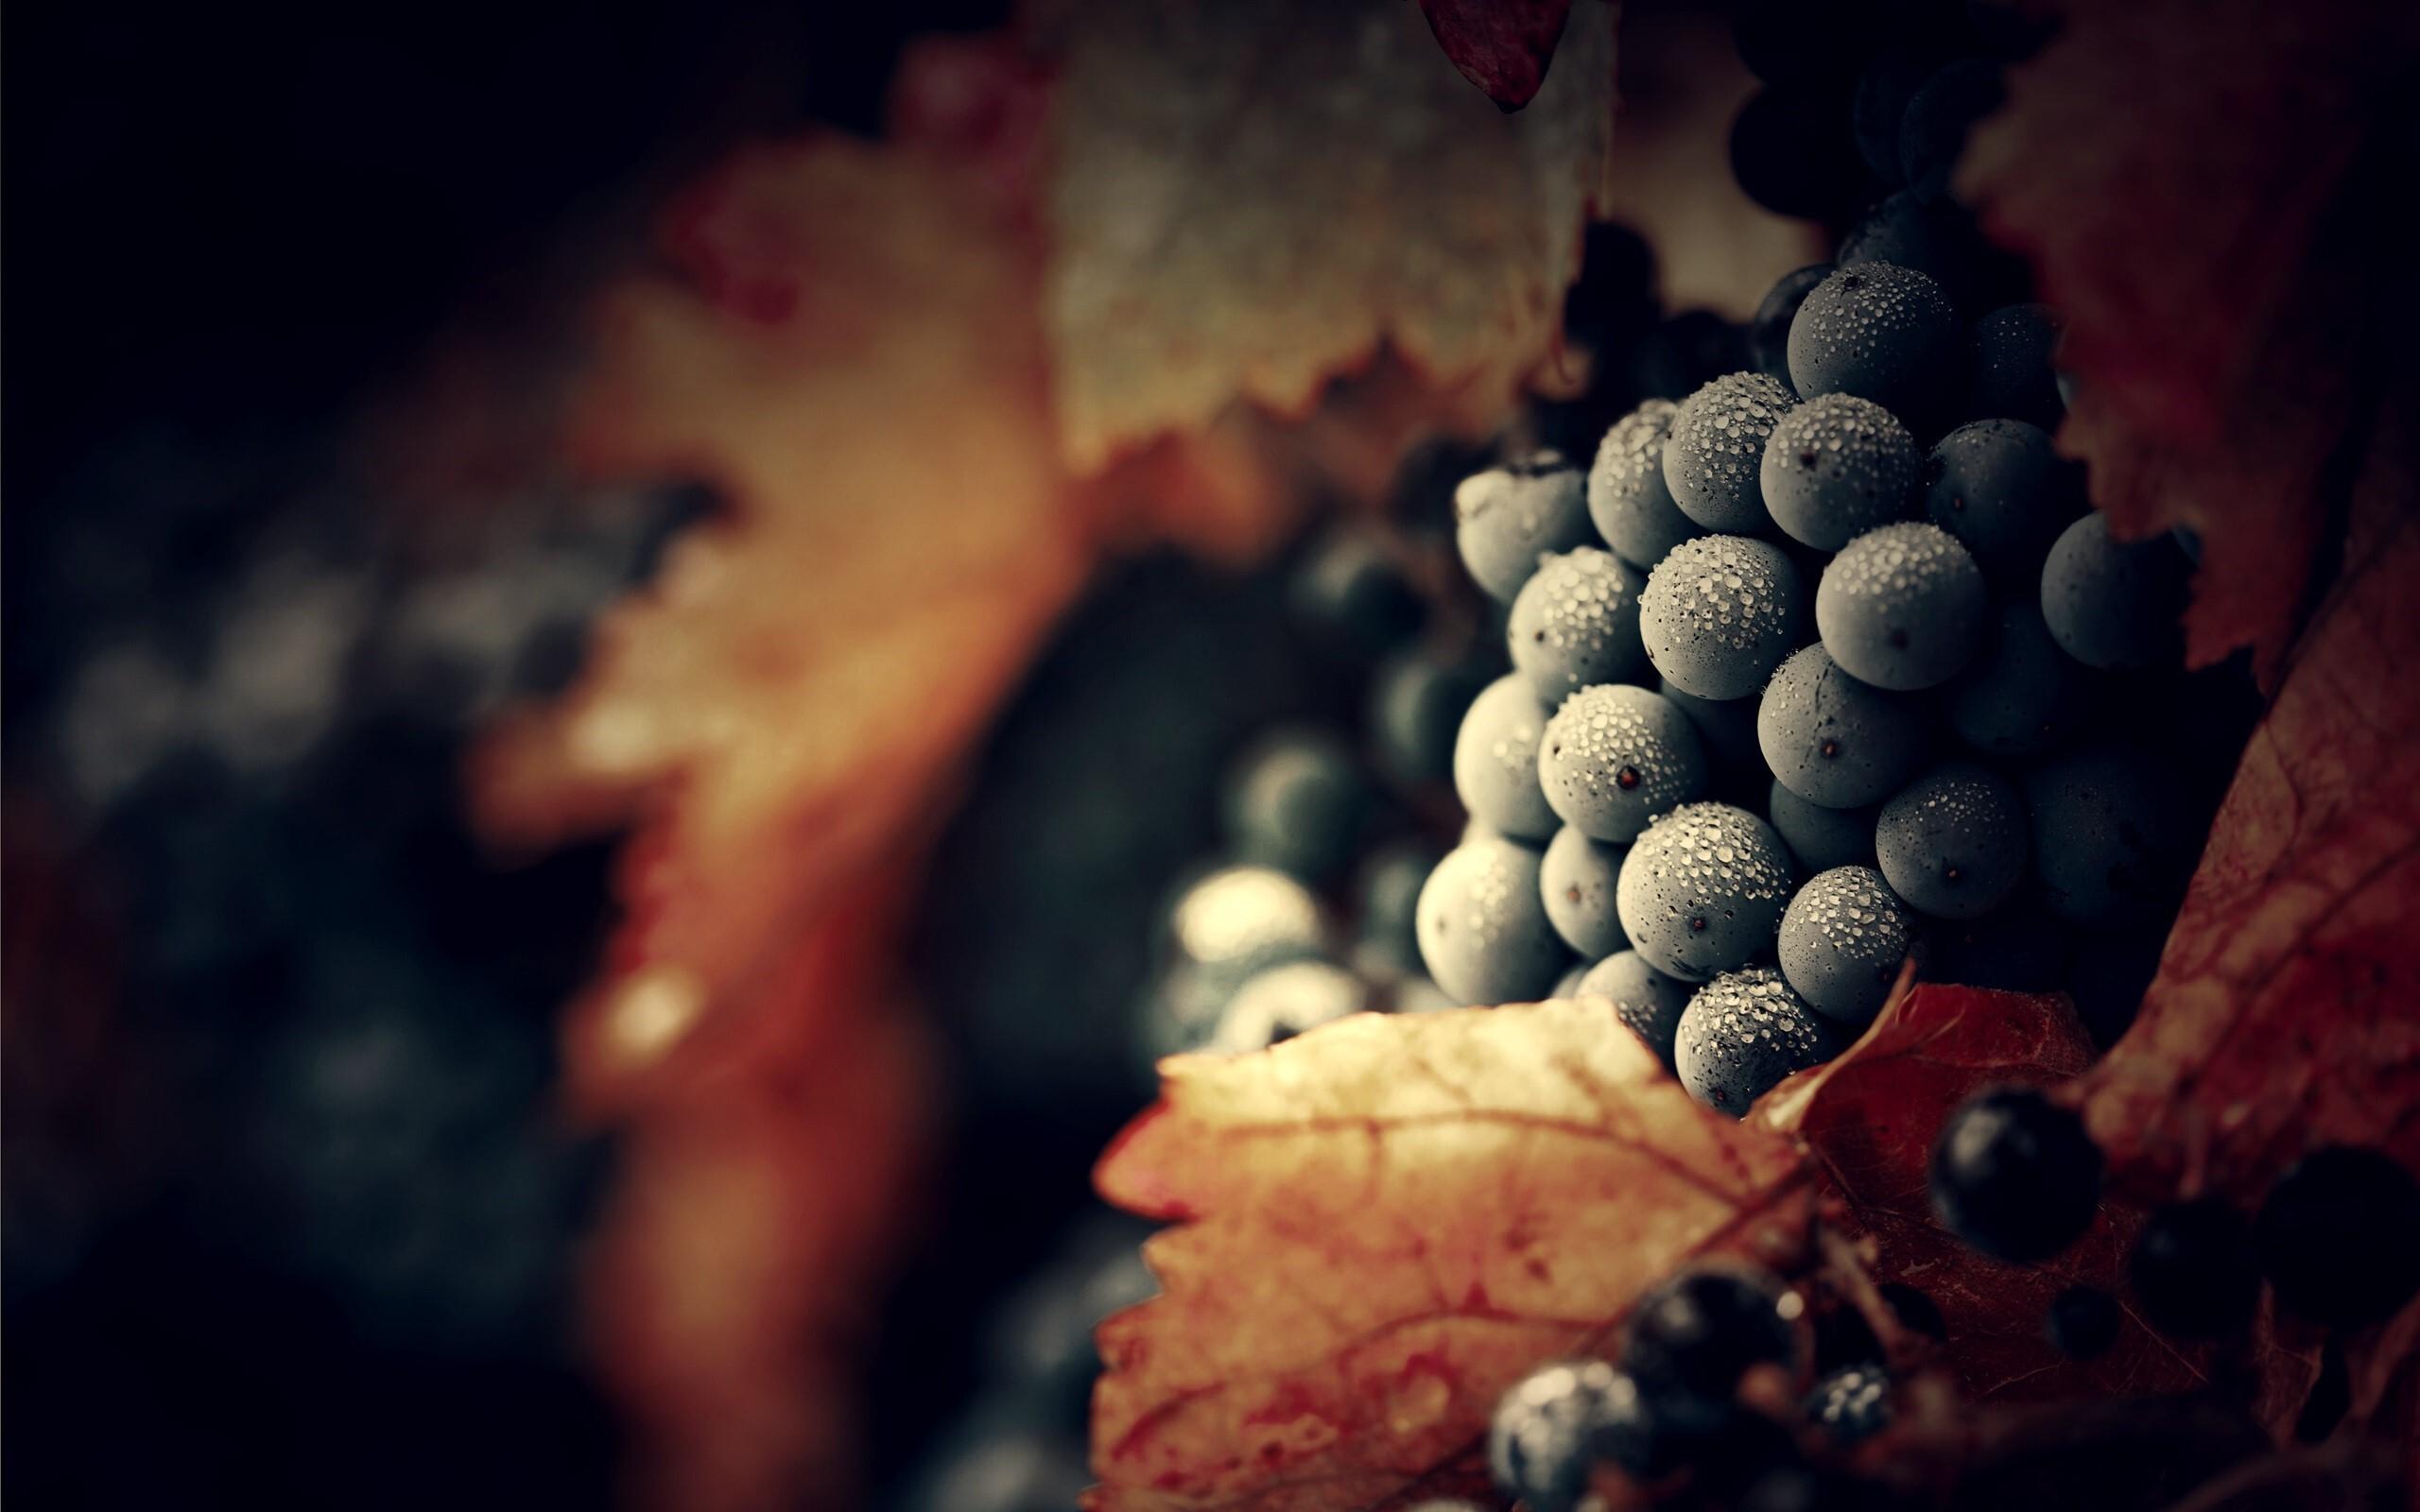 Nice Fog Drops on Black Grapes Fruits HD Images   HD ...